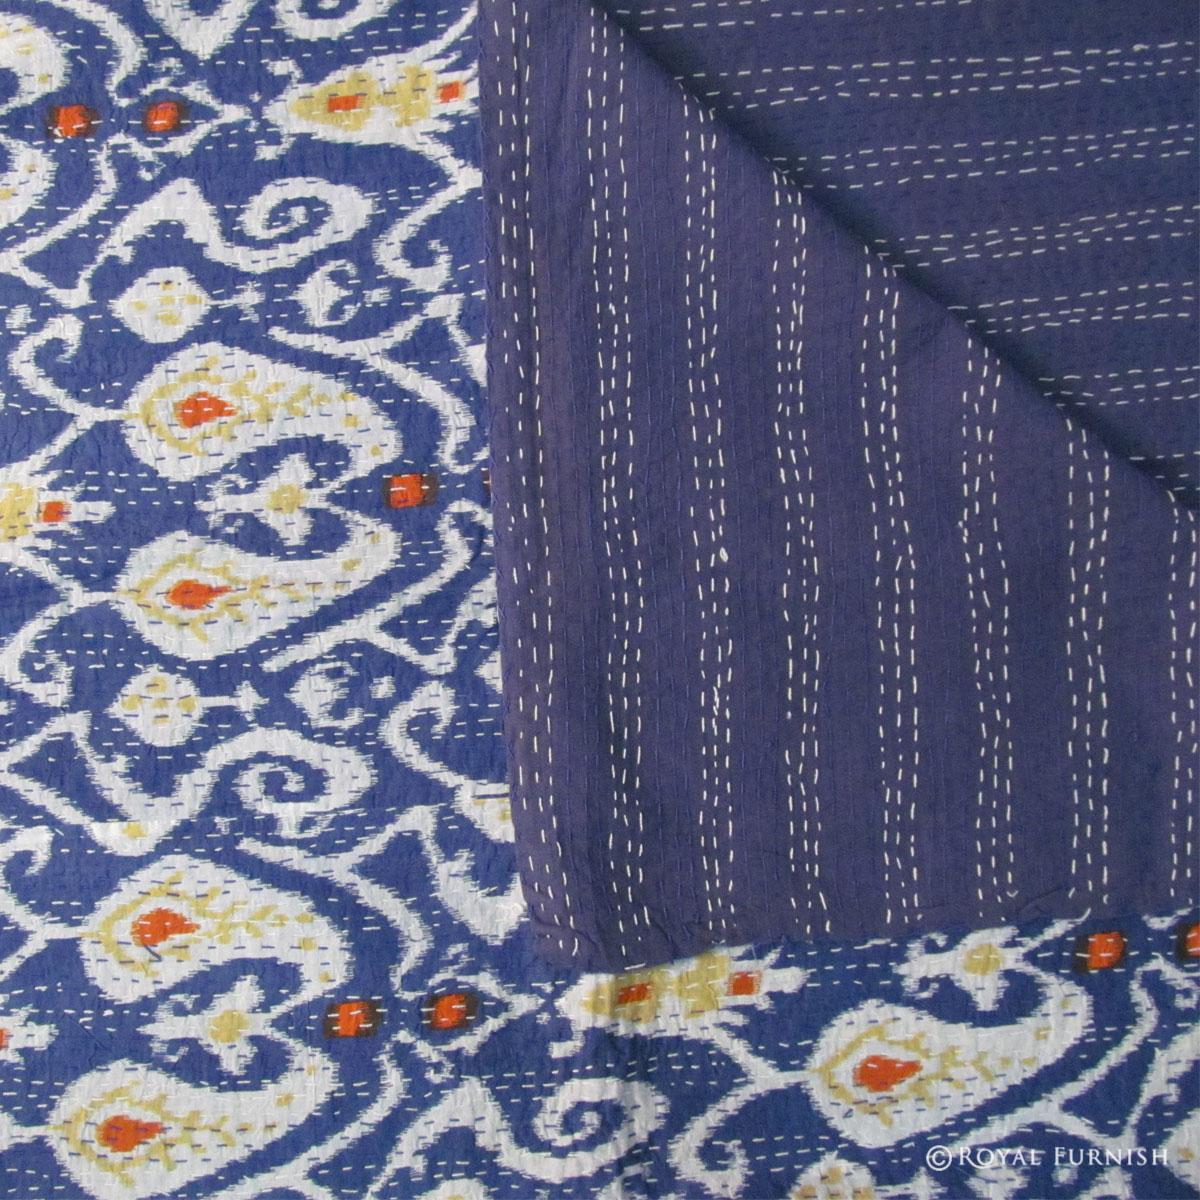 Blue Queen Size Floral Print Ikat Kantha Quilt Blanket